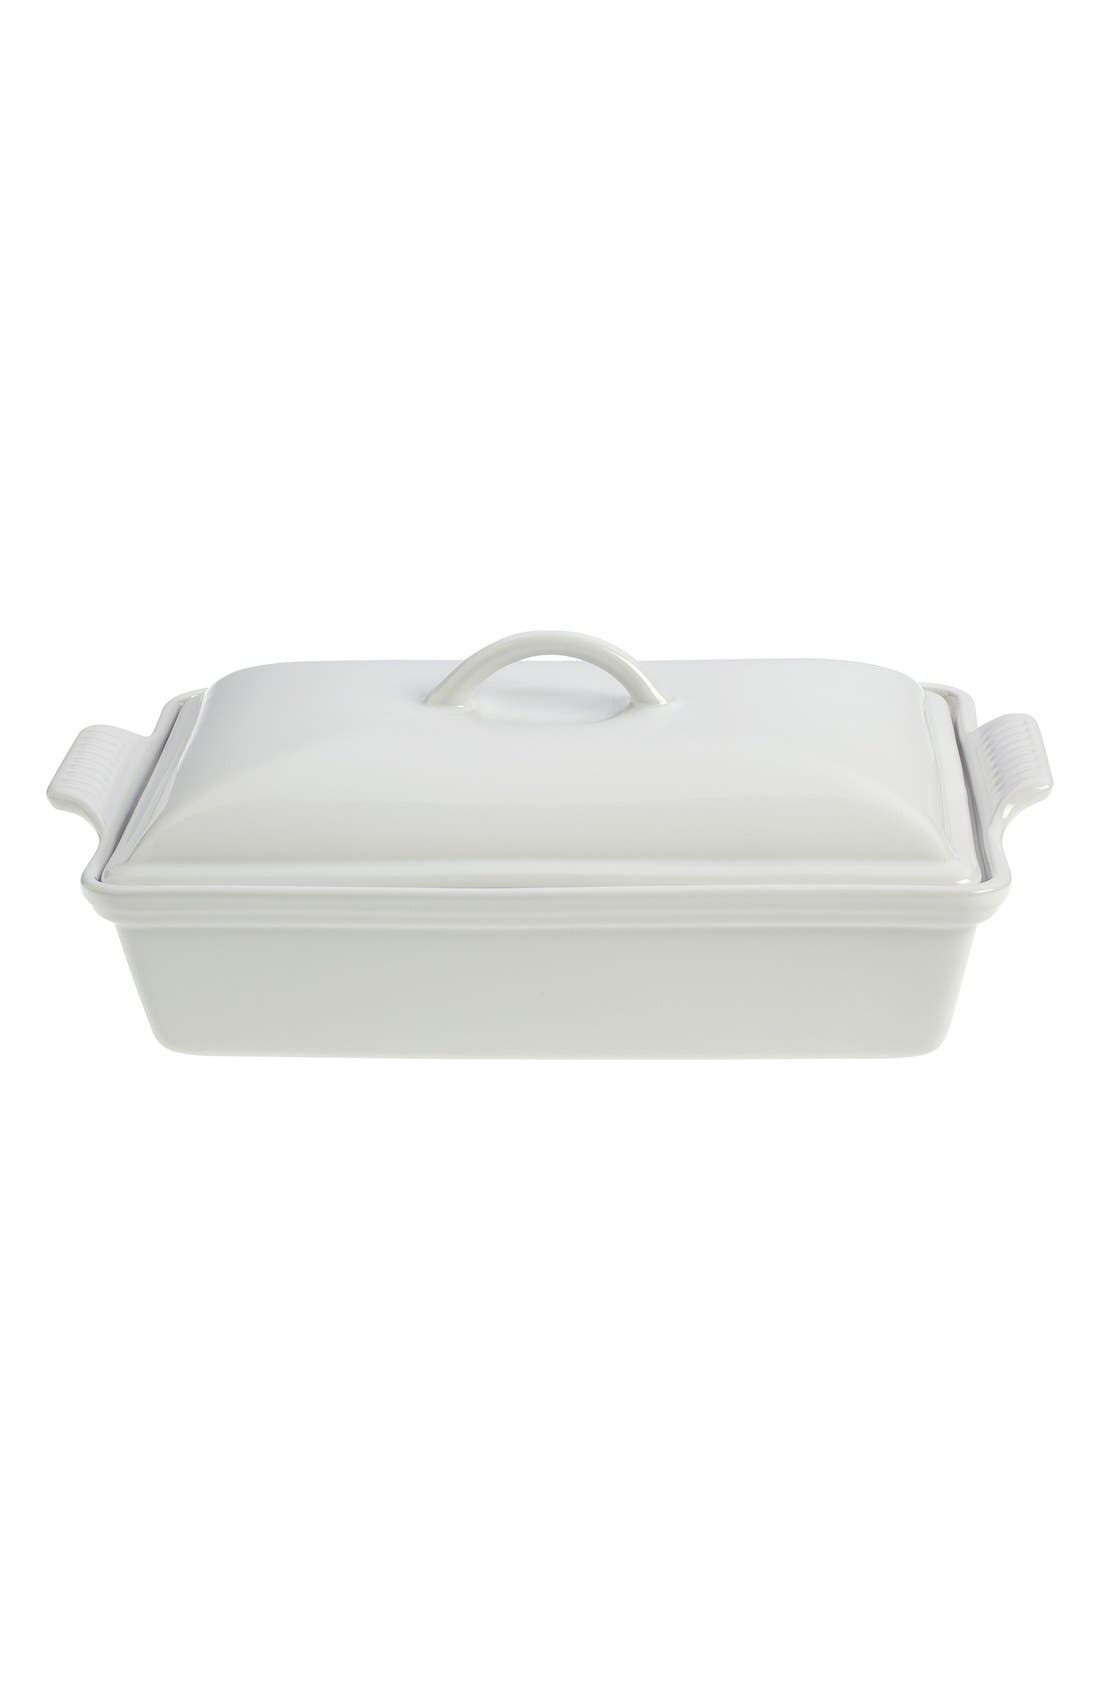 Le Creuset 4 Quart Covered Rectangular Stoneware Casserole Size One Size  White